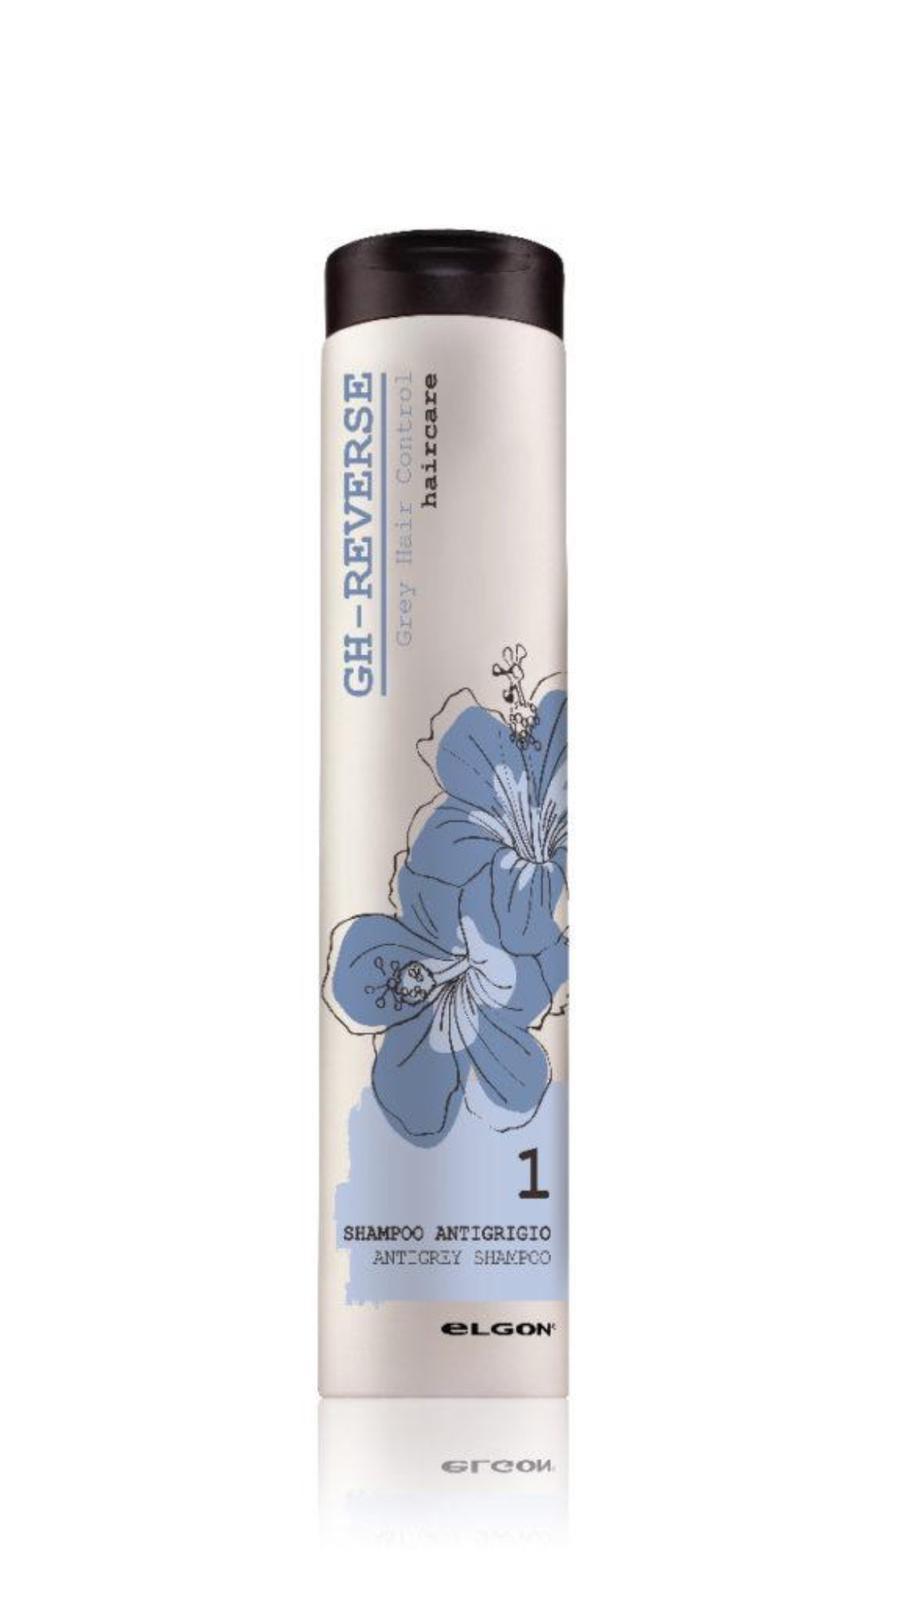 Shampoo Antigrigio - GH-REVERSE